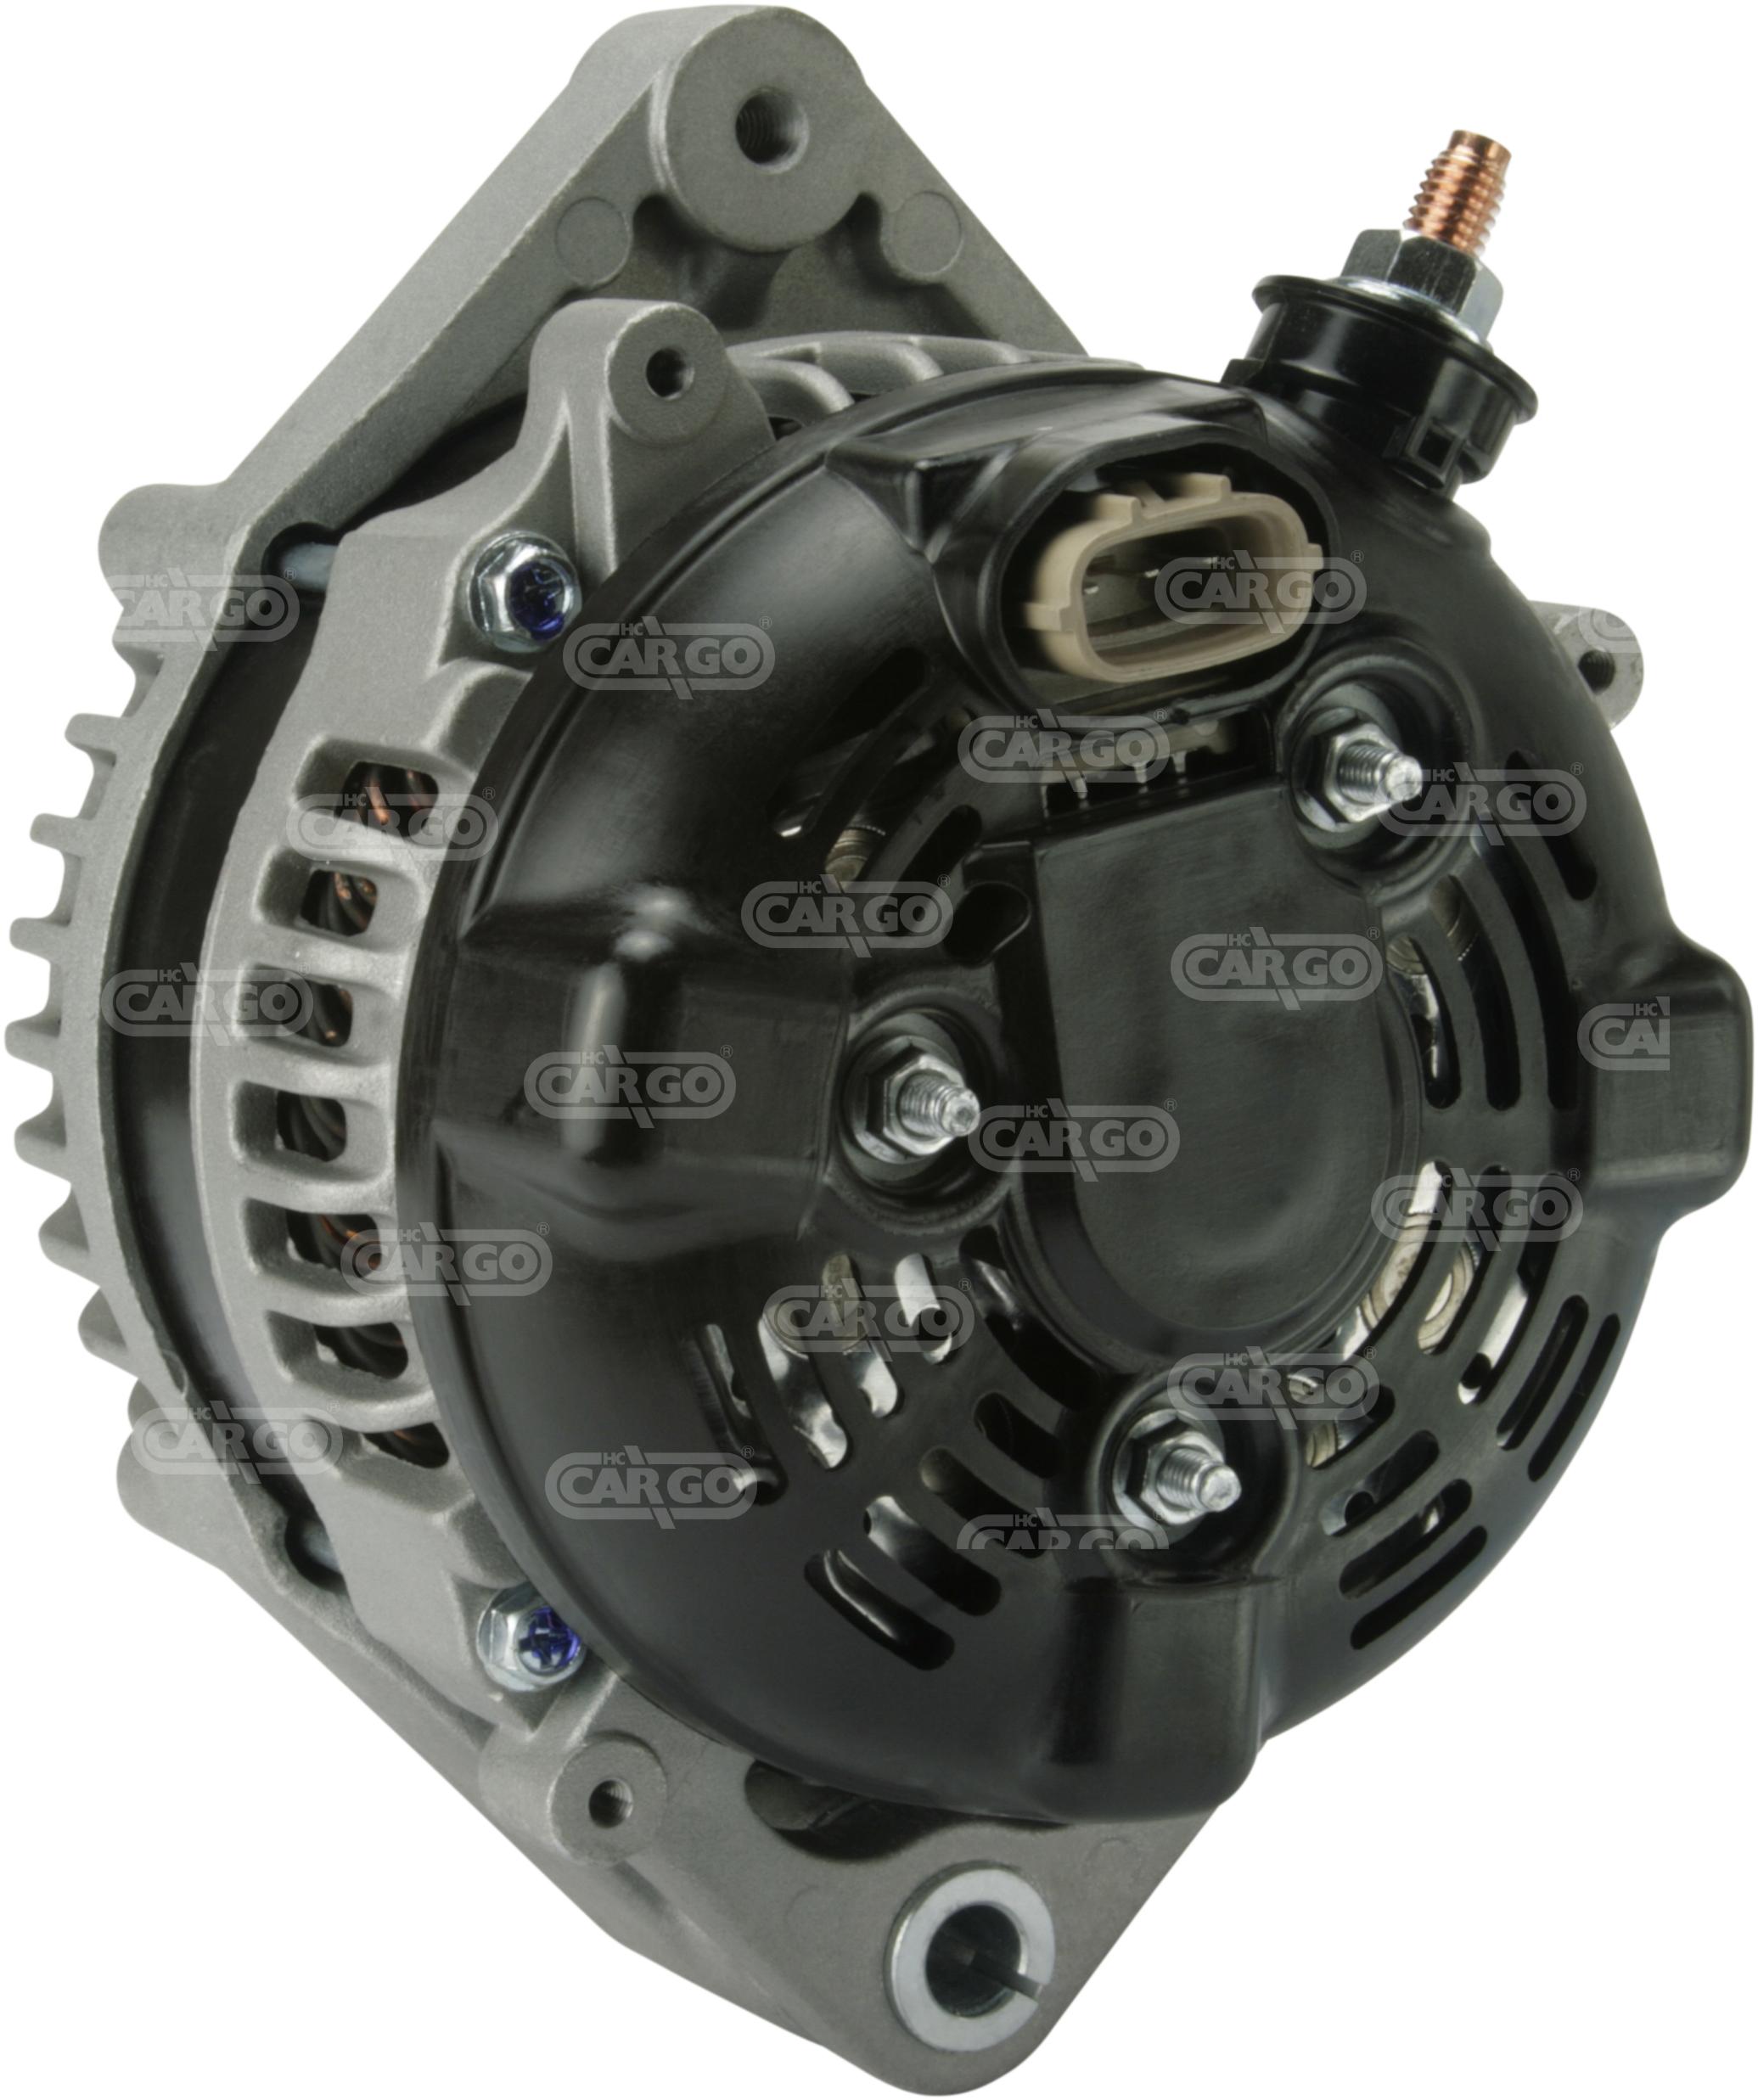 Alternateur 975 Voltage14 Amp150